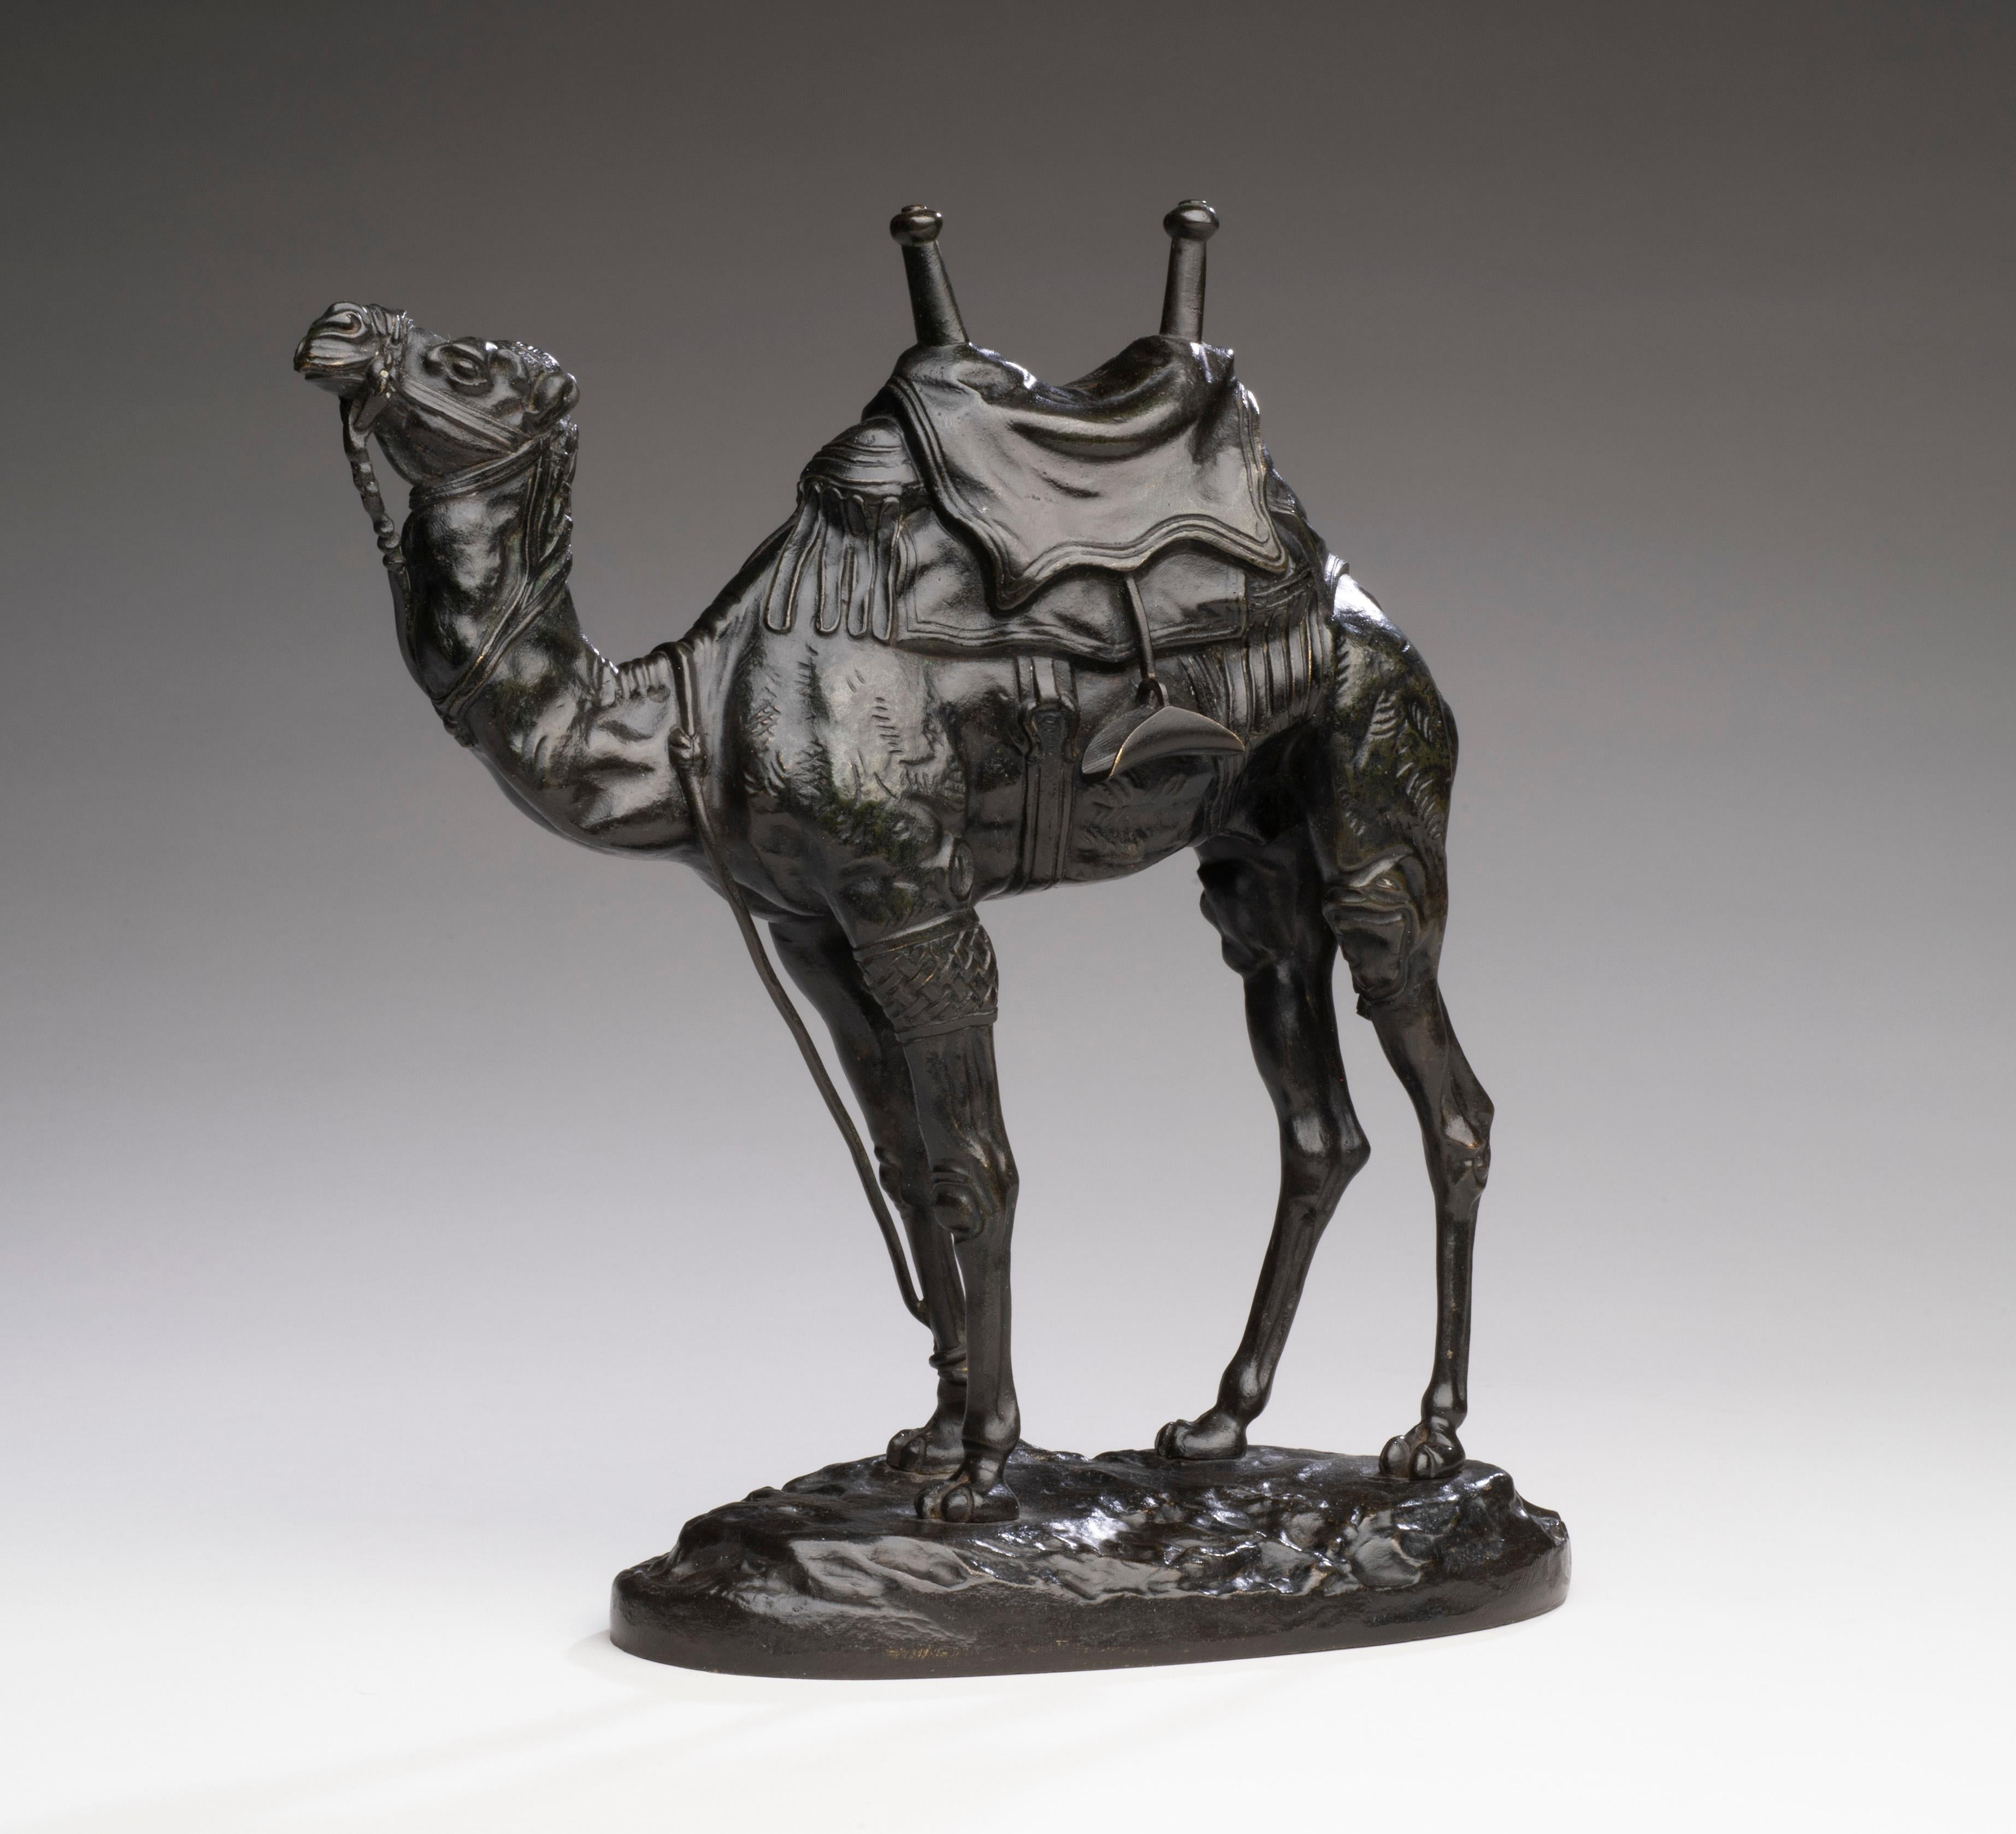 Bronze Model of an Egyptian Dromedary Camel by Antoine-Louis Barye circa 1860's